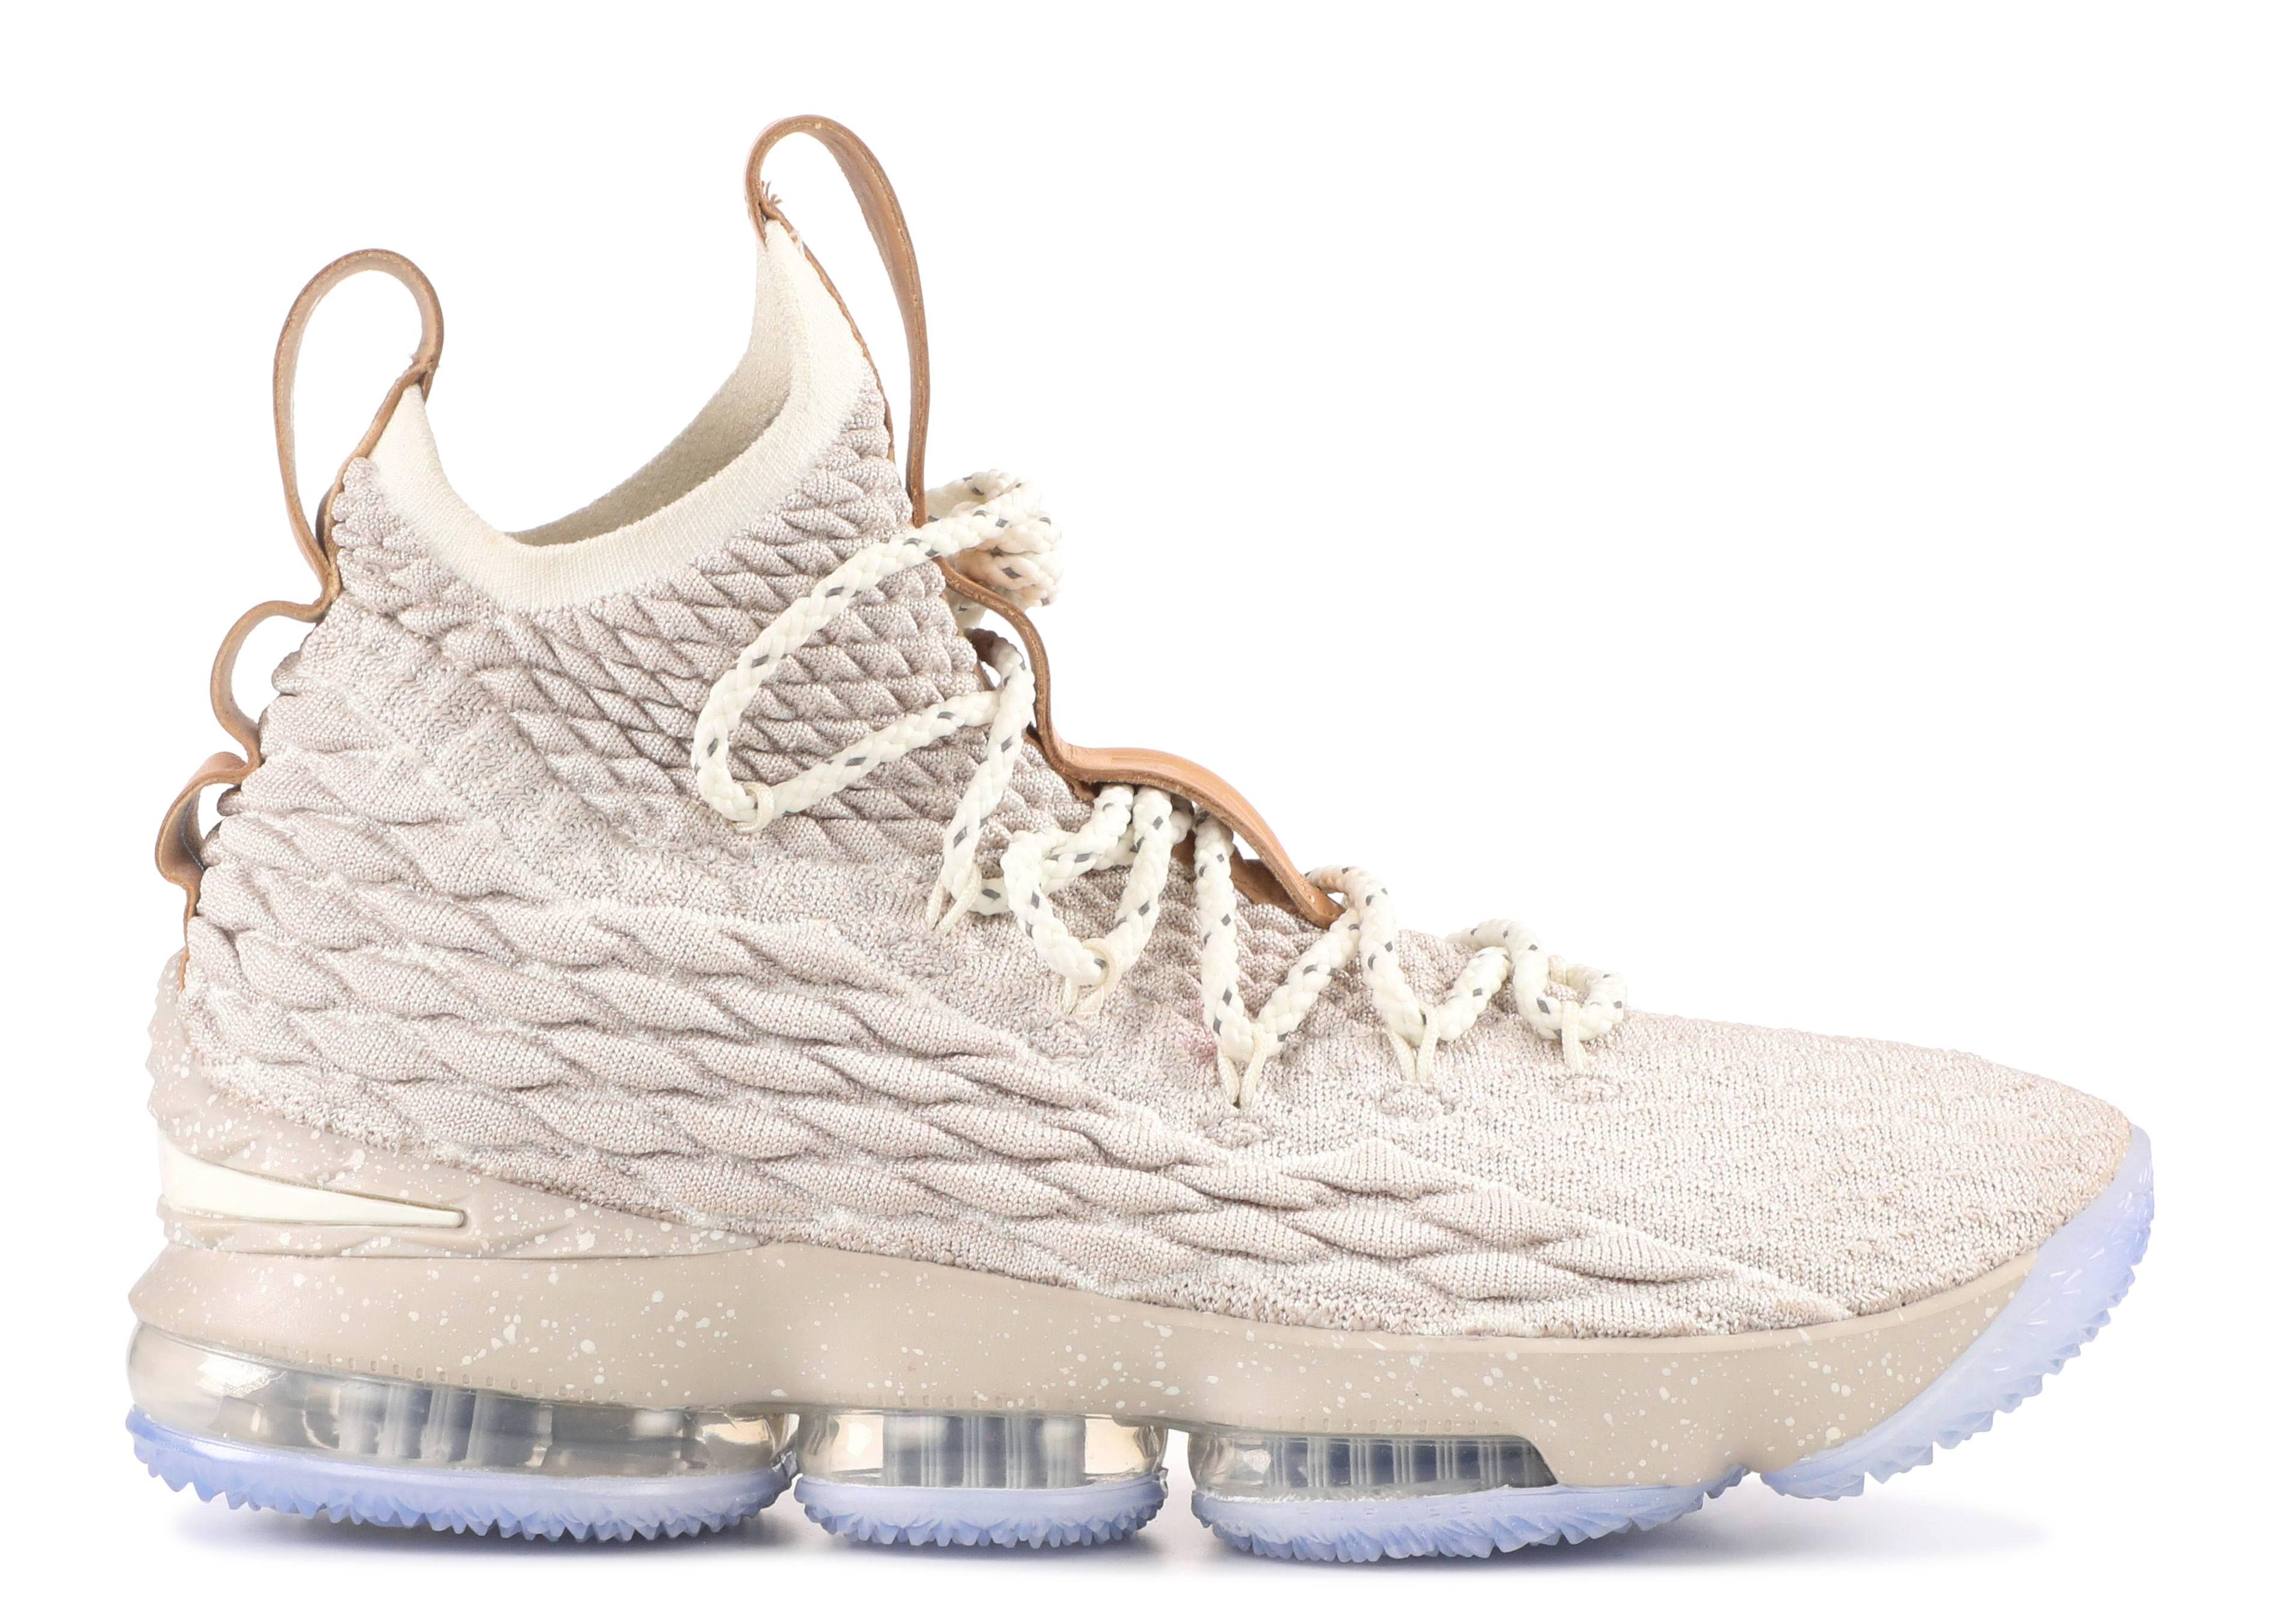 buy popular 3ec4f cd6ac Lebron 15 - Nike - 897648 200 - stringsail-vachetta tan  Fli